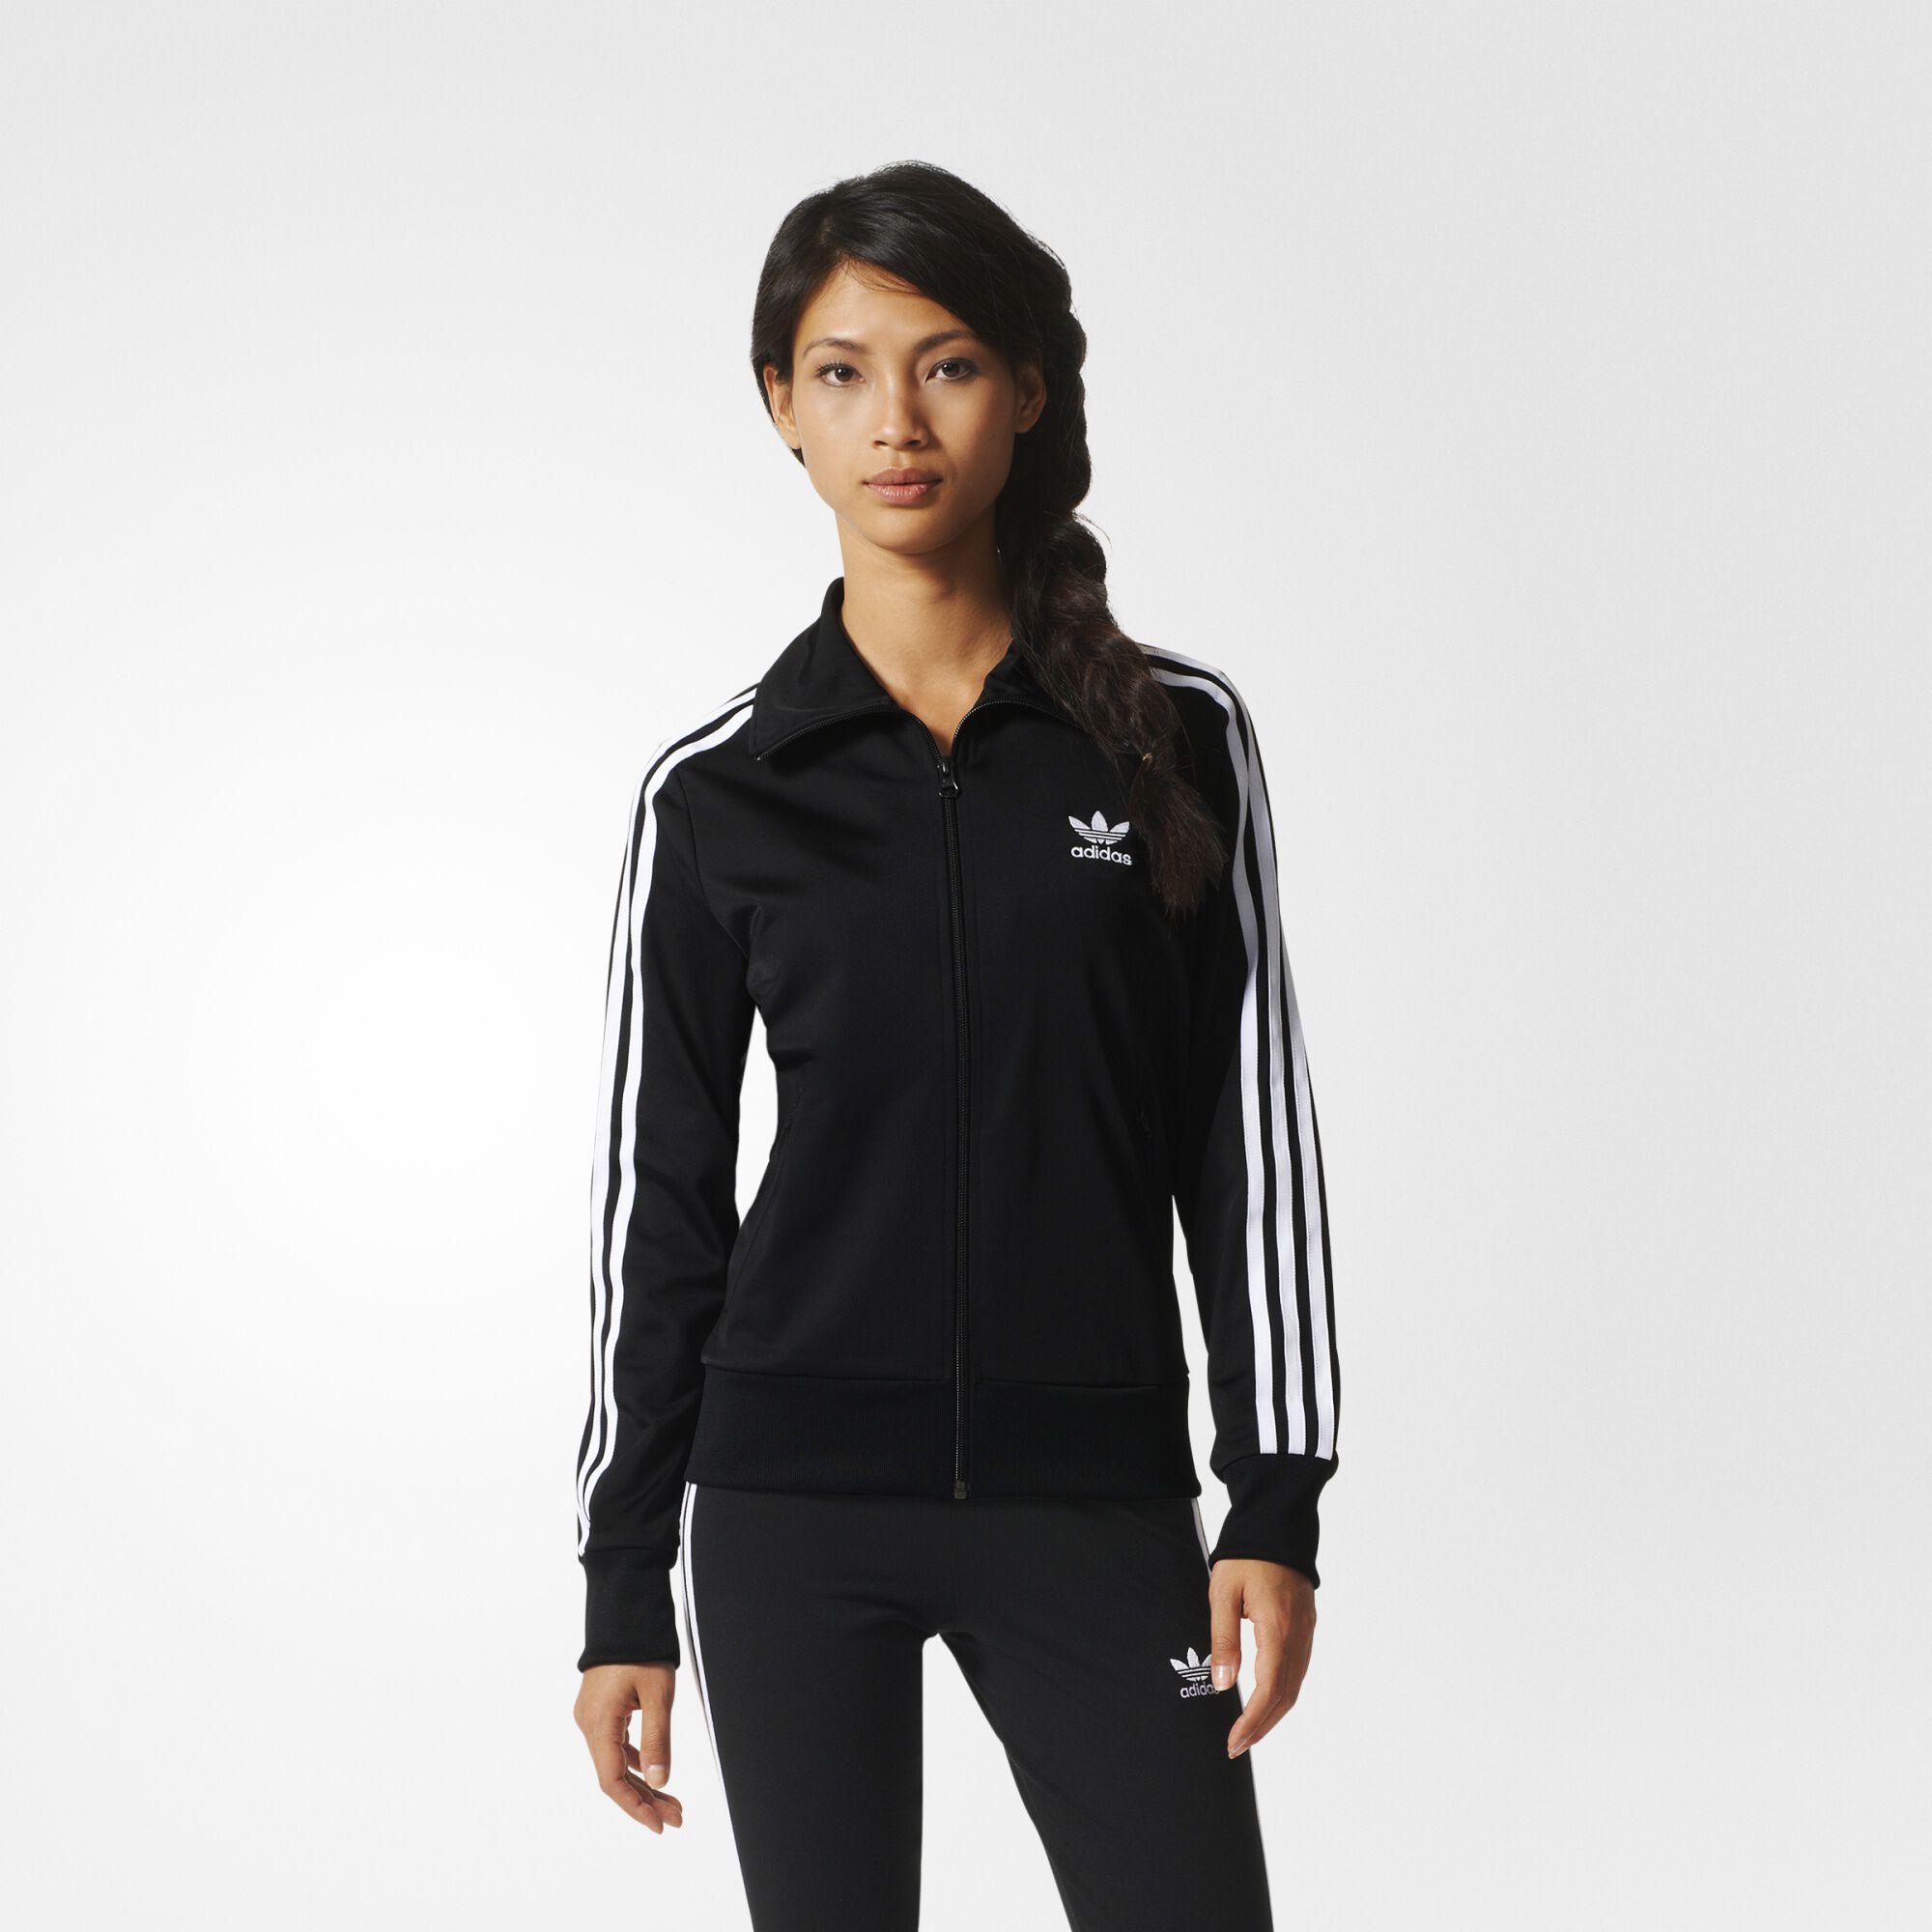 buy adidas jacket